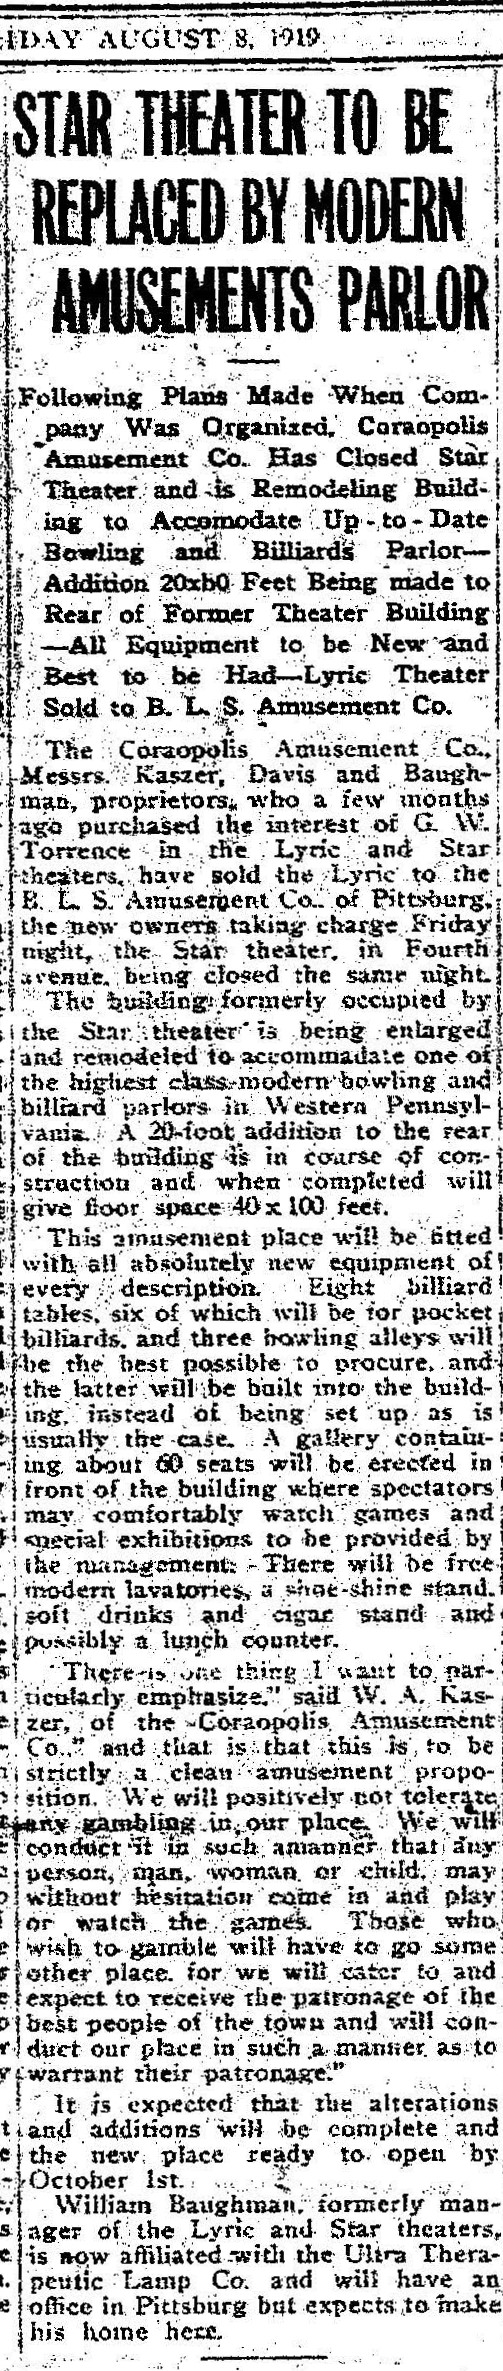 1919-08-08 Star Theater - The Coraopolis Record (vXIV, n23 , p1).jpg